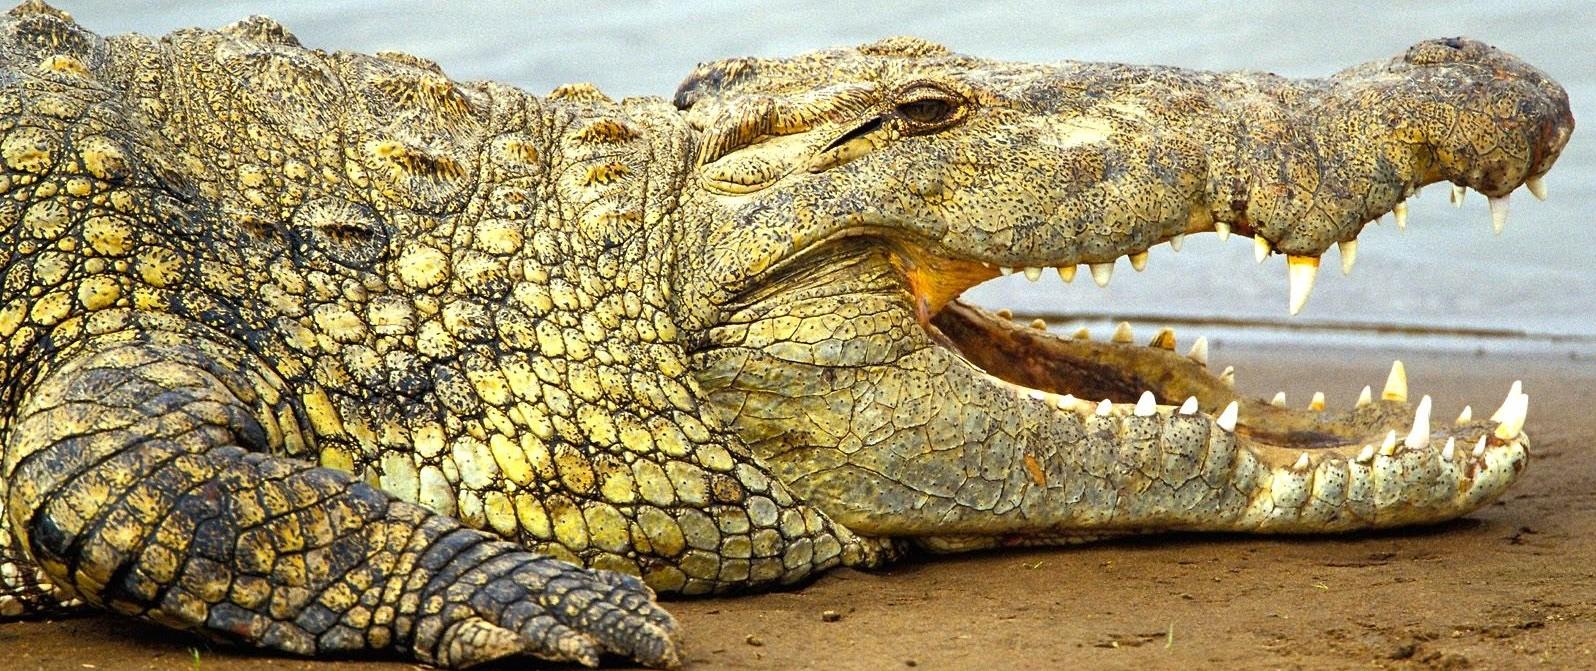 BRIEF FACTS ABOUT NILE CROCODILES – UGANDA SAFARI NEWS - Prime Uganda  Safaris & Tours